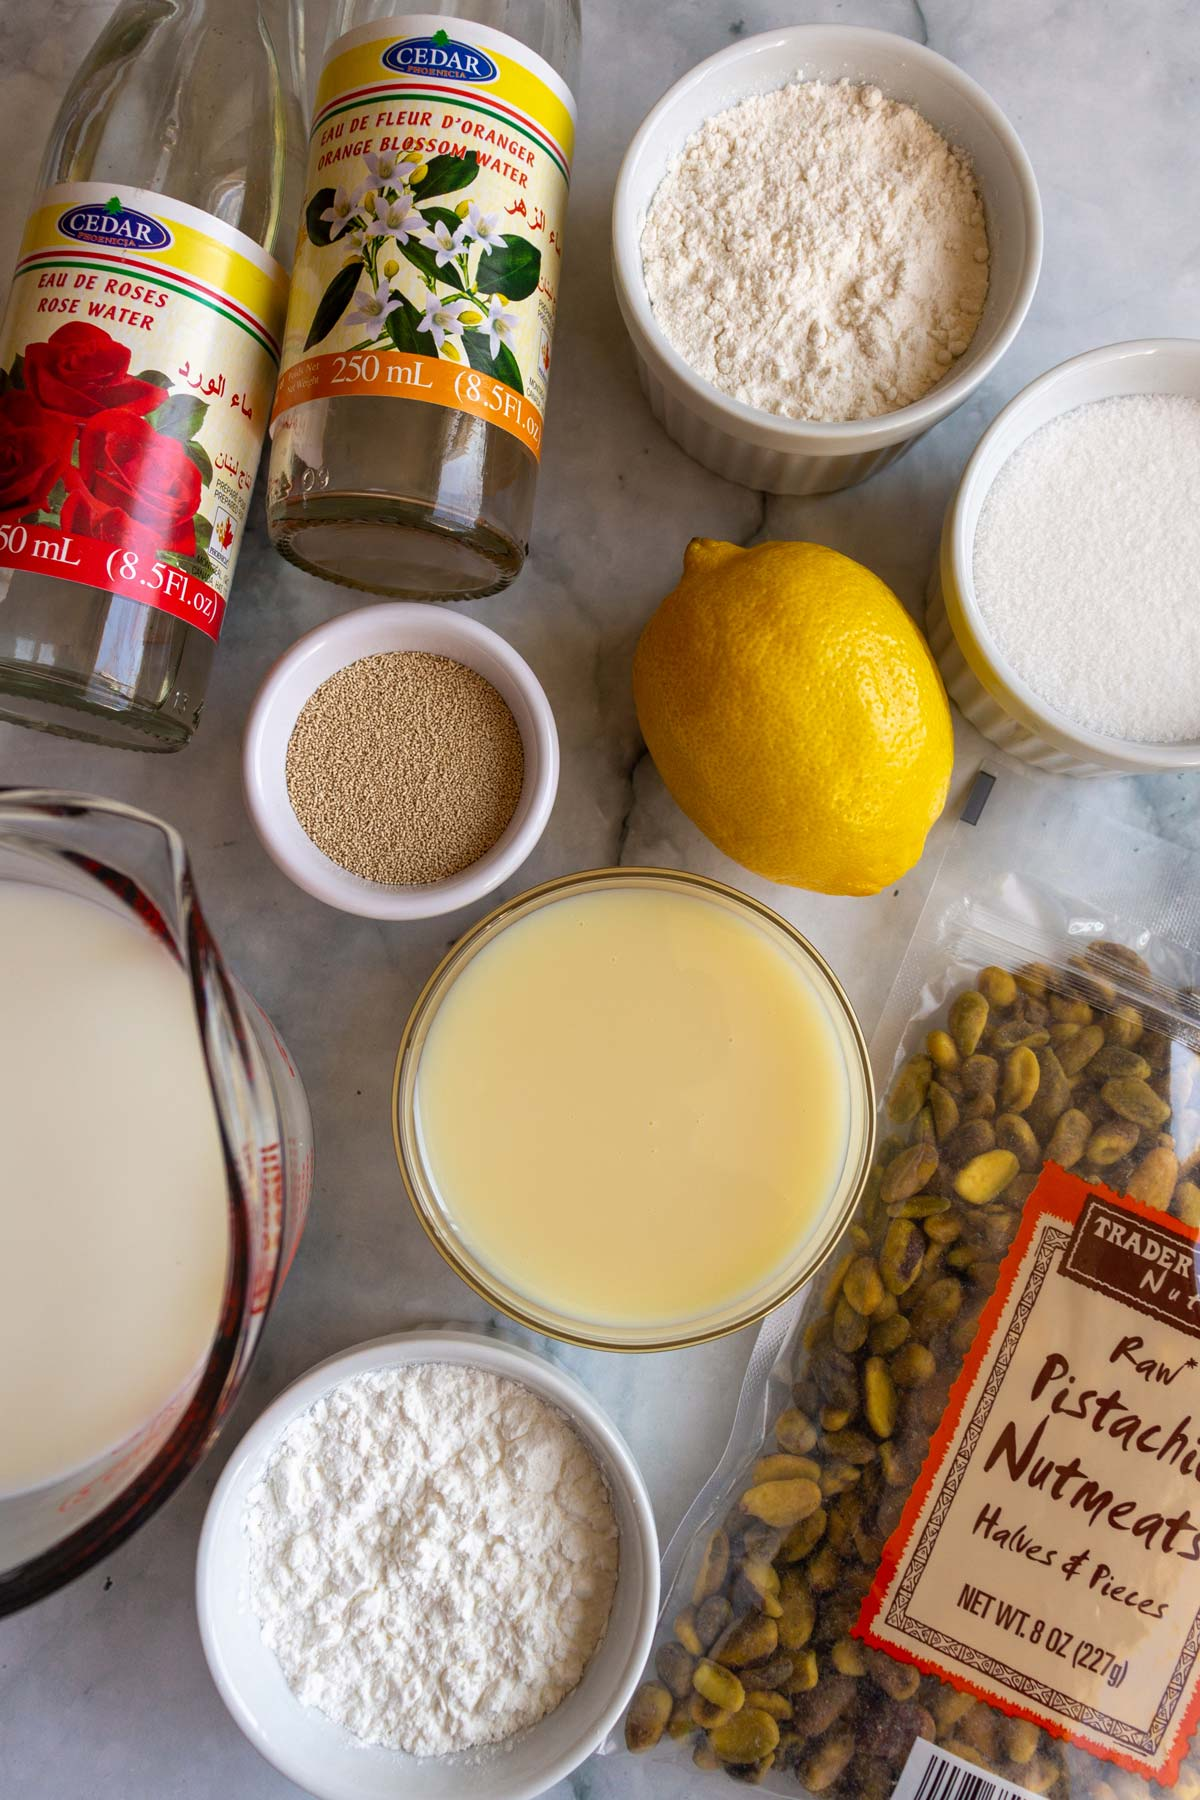 Rose and orange blossom water, flour, sugar, cornstarch, yeast, milk, condensed milk, a lemon and pistachios.